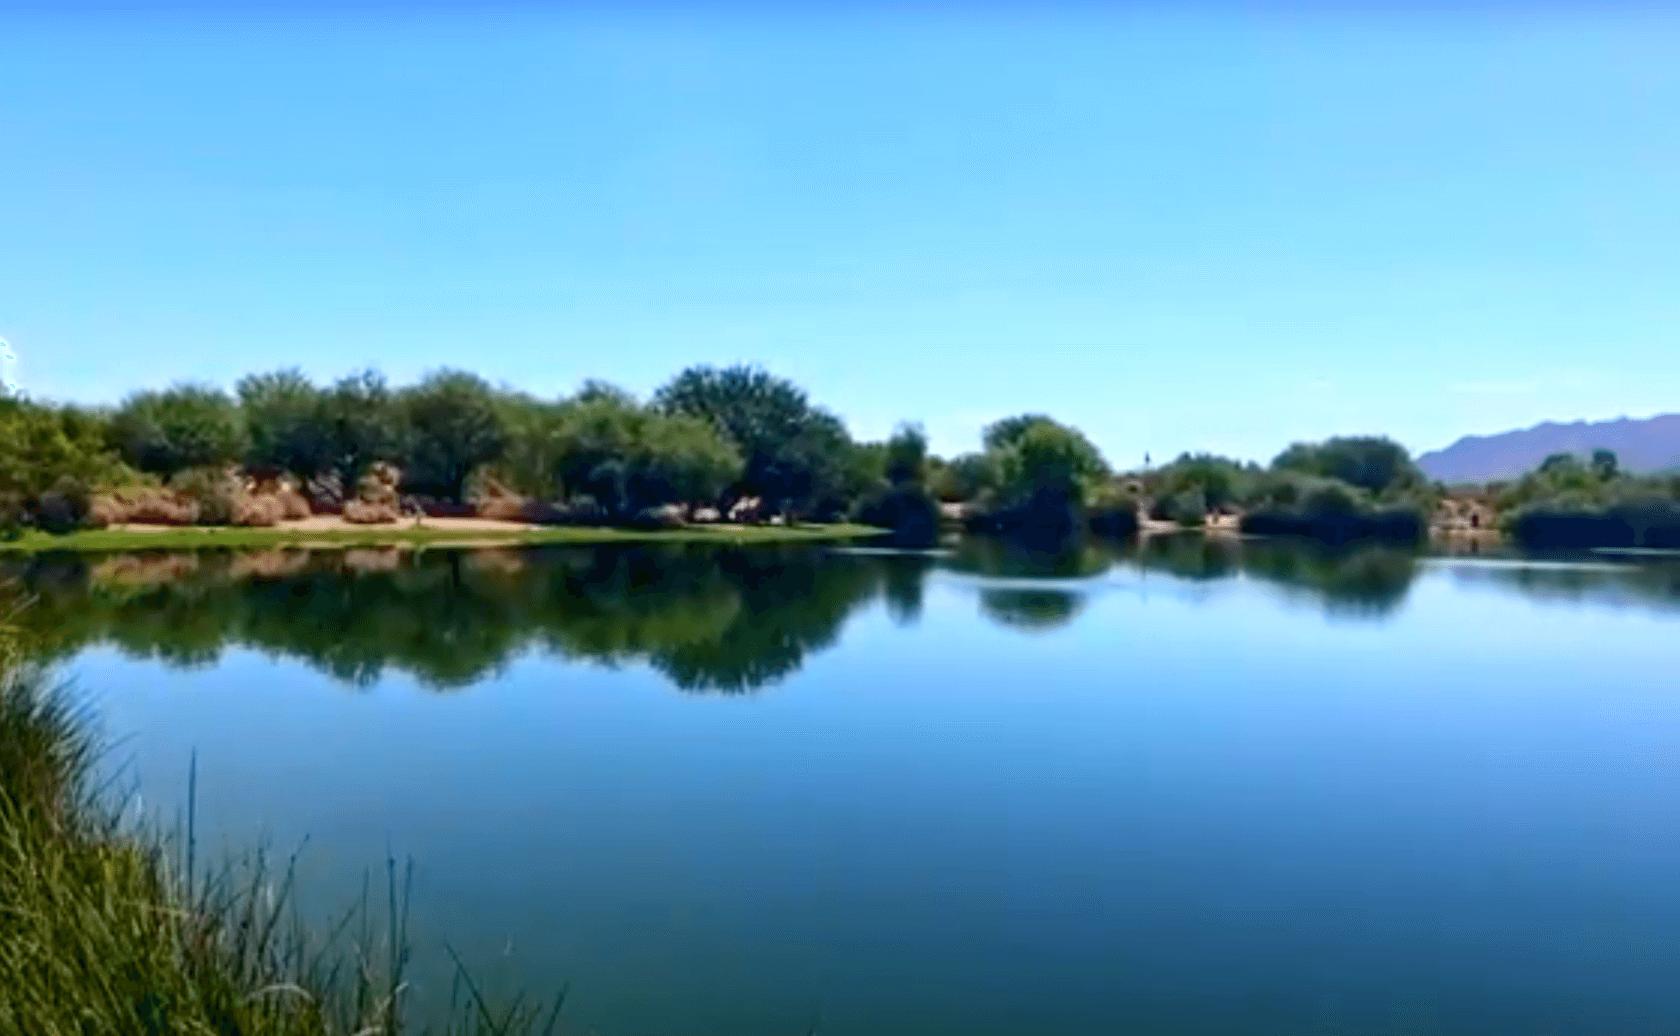 Veterans-Oasis-Community-Lake-Fishing-Guide-Chandler-AZ-02